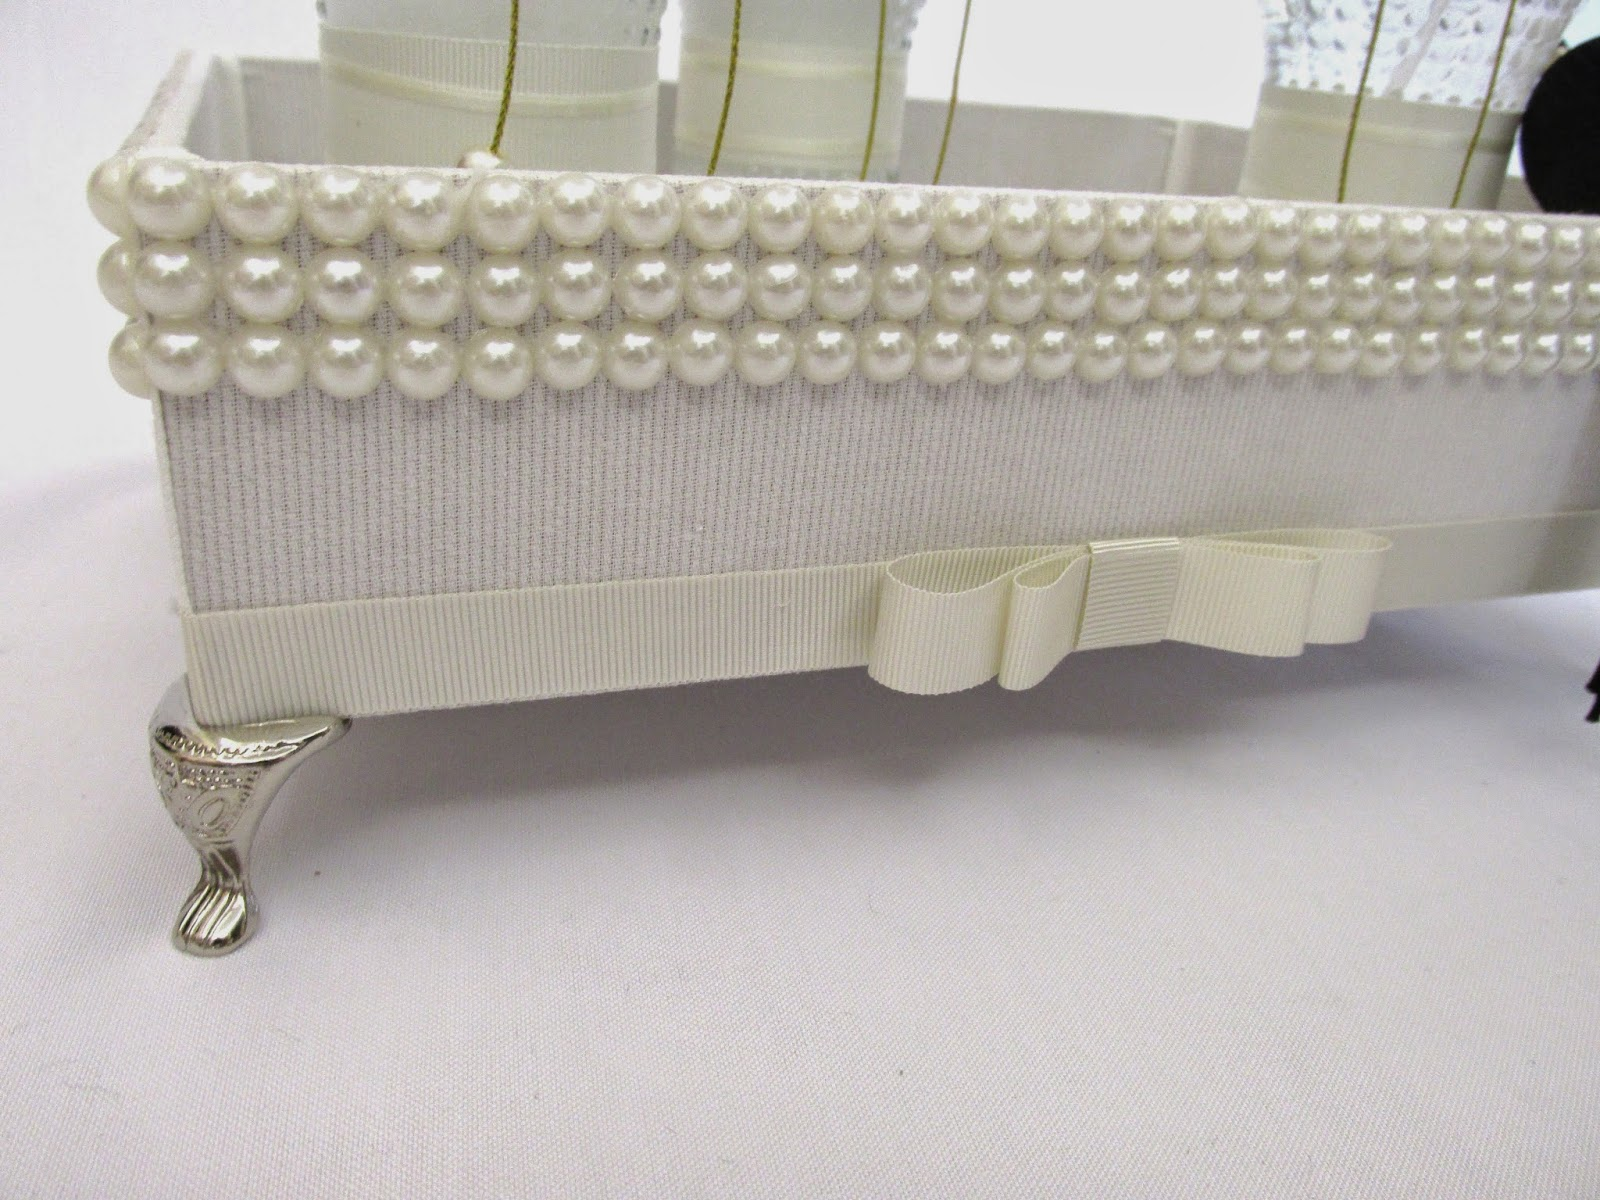 Kit lavabo luxo Bandeja de MDF forrada de tecido off white com  #716C48 1600 1200